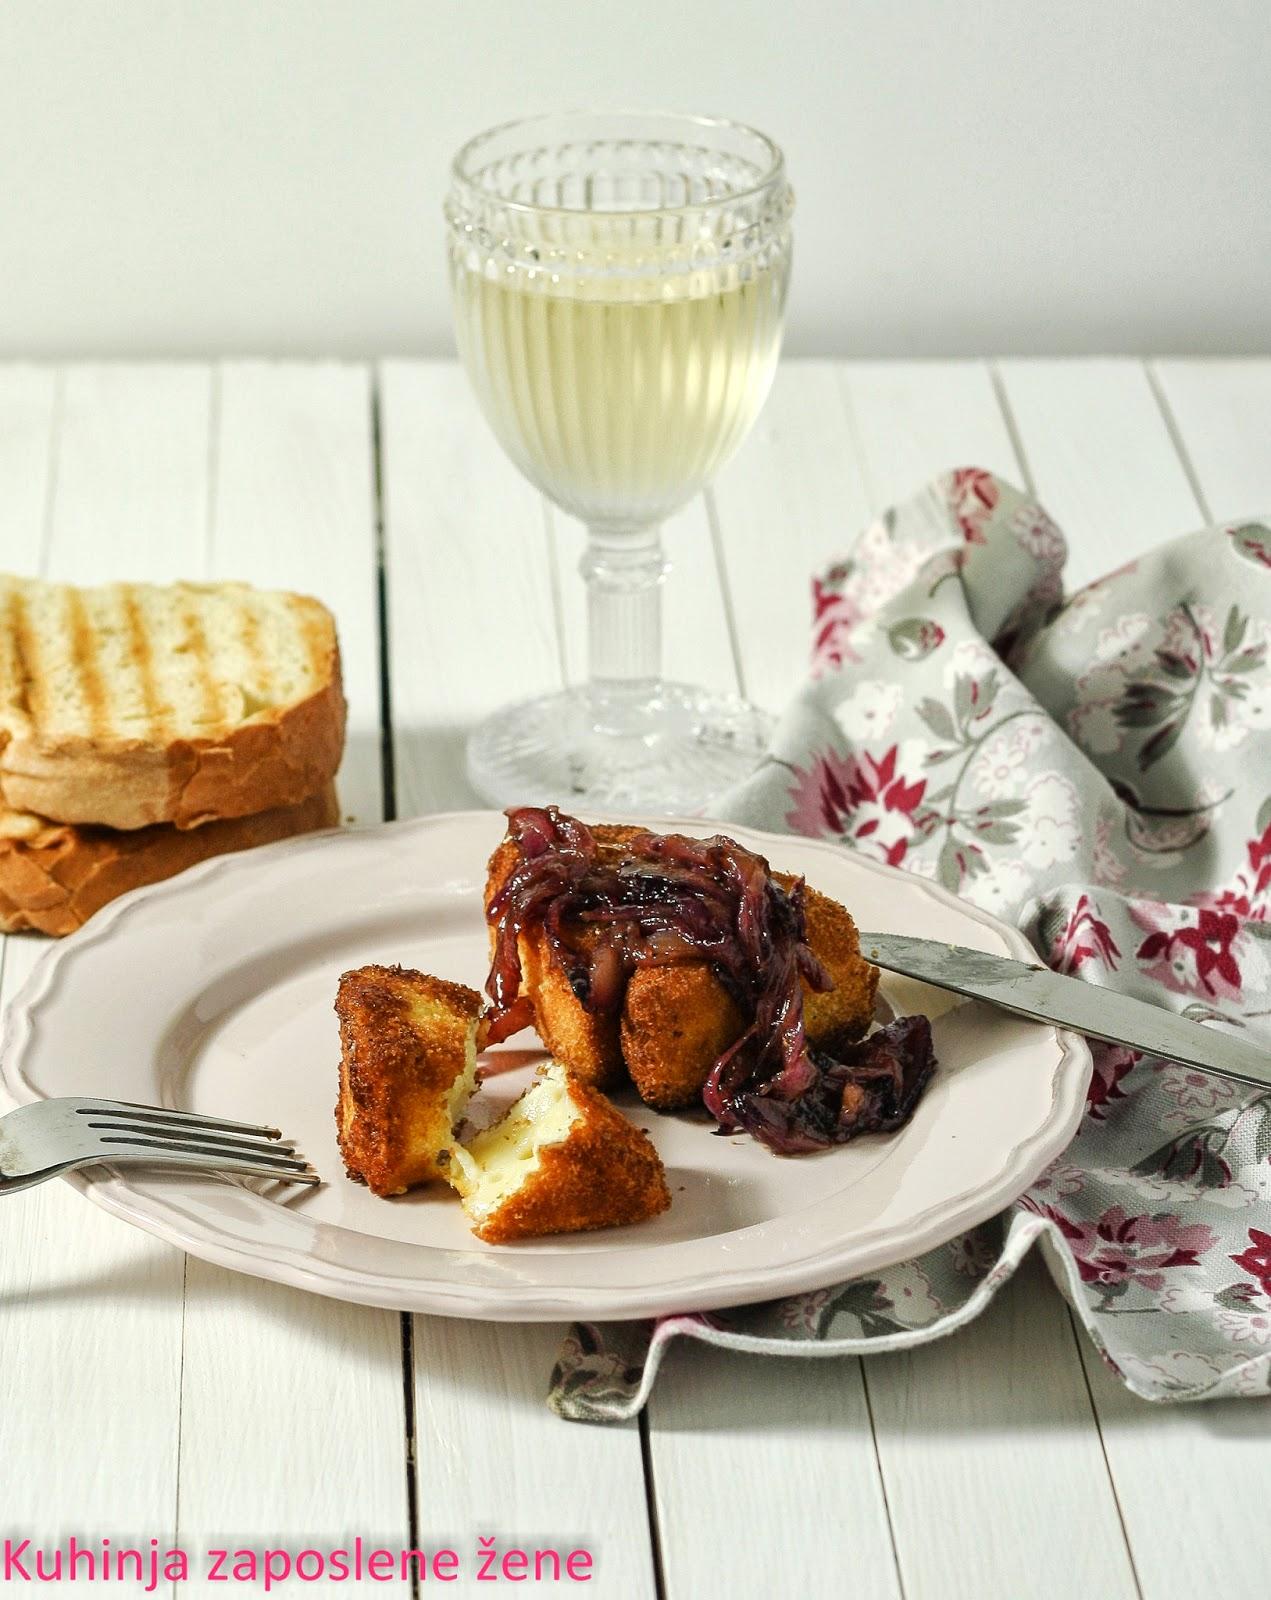 Pohovani kamember sa karamelizovanim lukom / Fried Camembert with caramelized onions